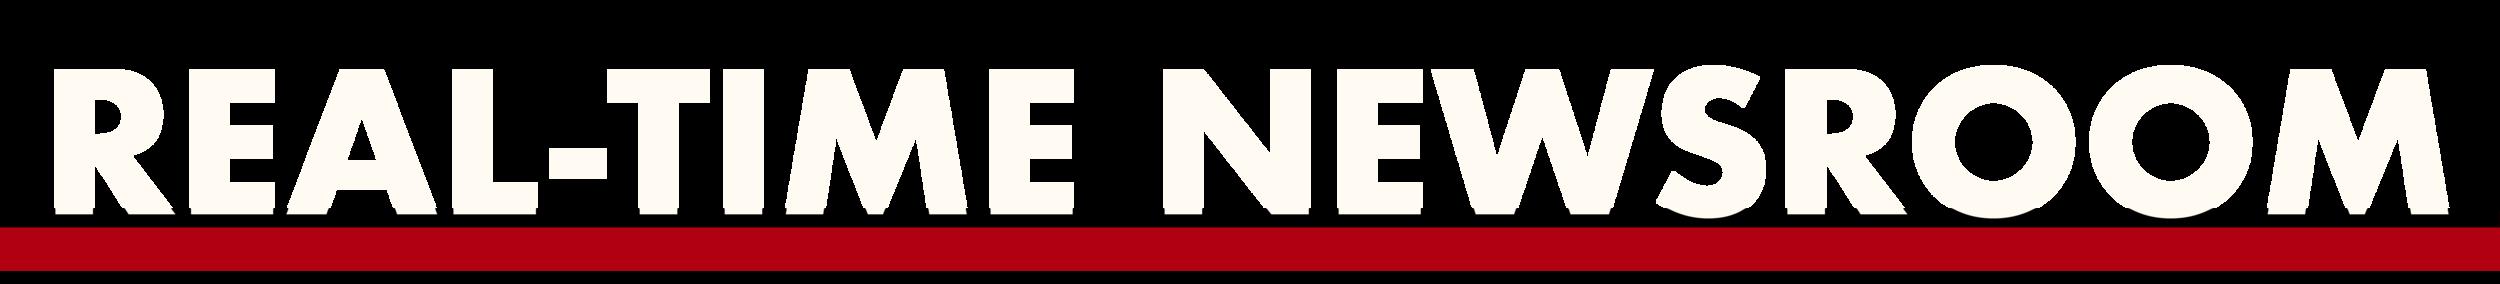 RealtimeNewsroom.png